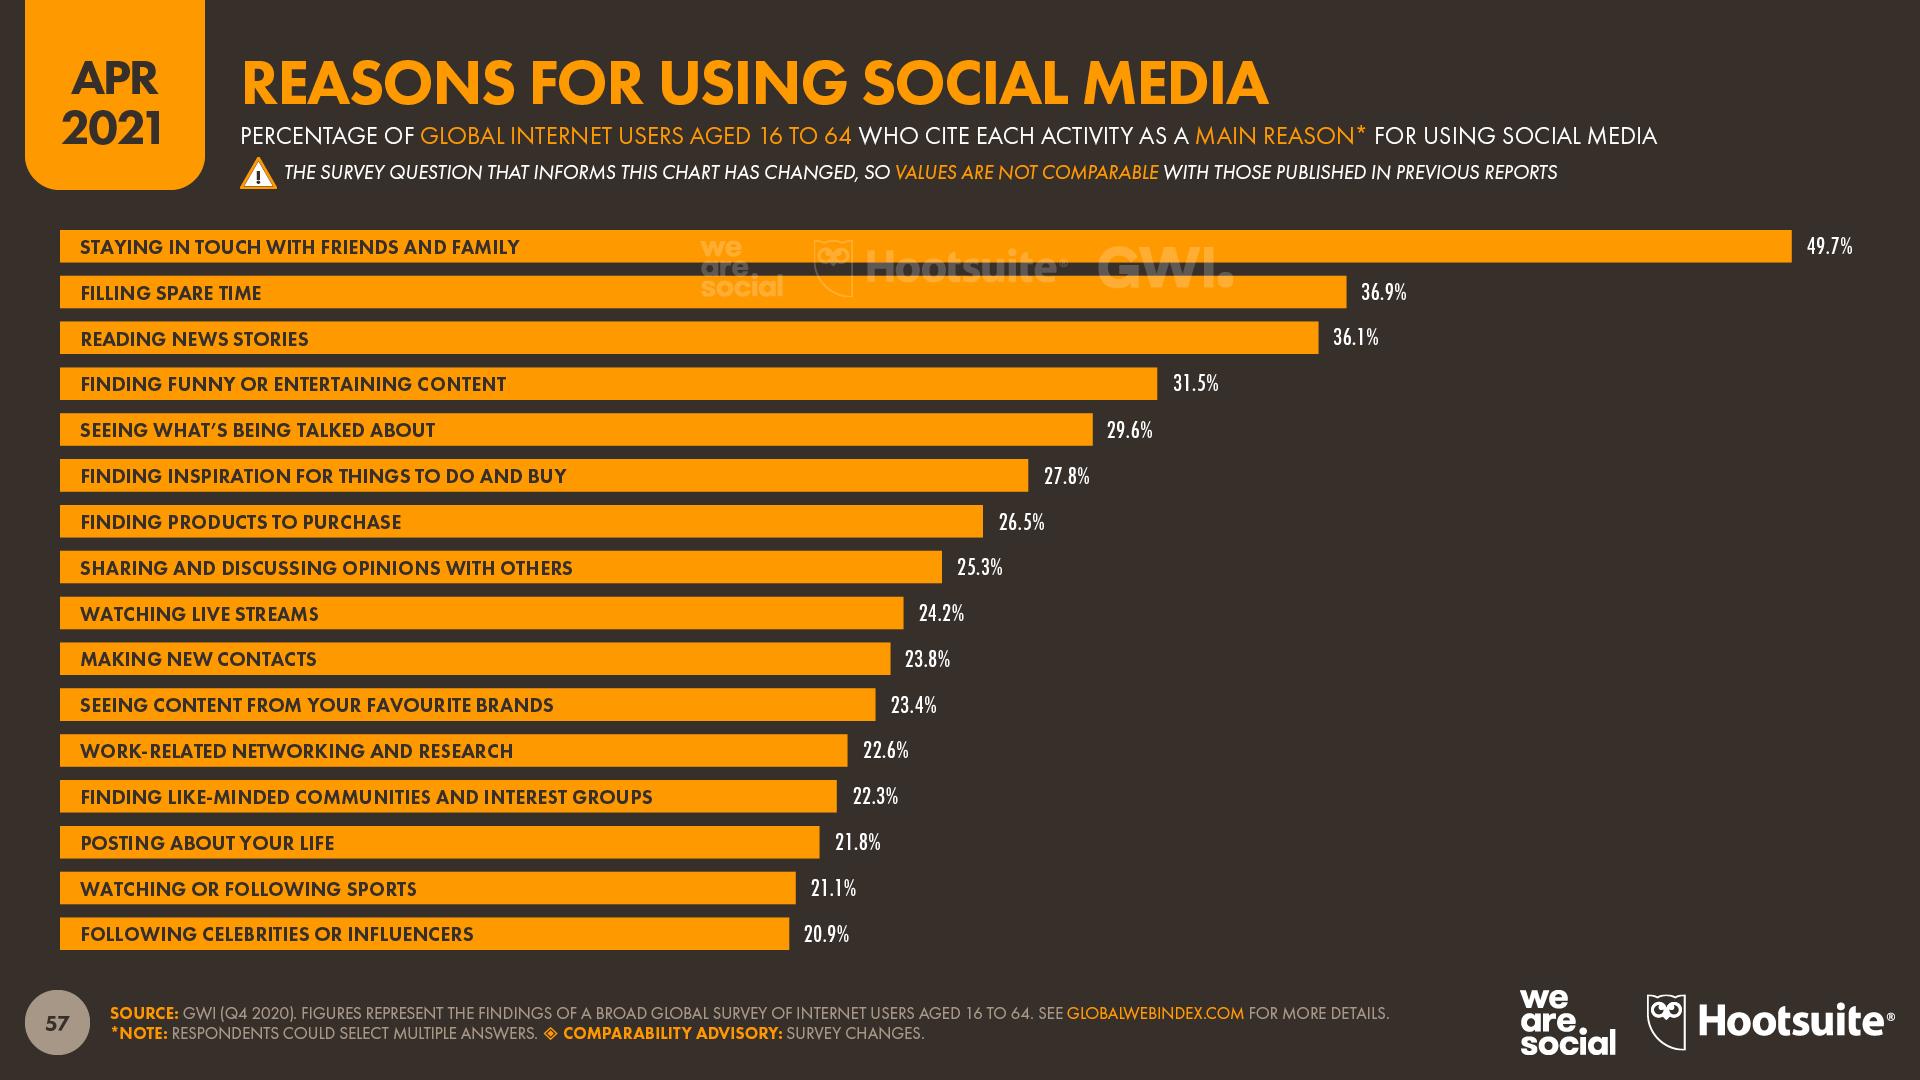 10 Slide 57 Reasons for Using Social - DataReportal 20210420 Digital 2021 April Global Statshot Report Slide 57.png